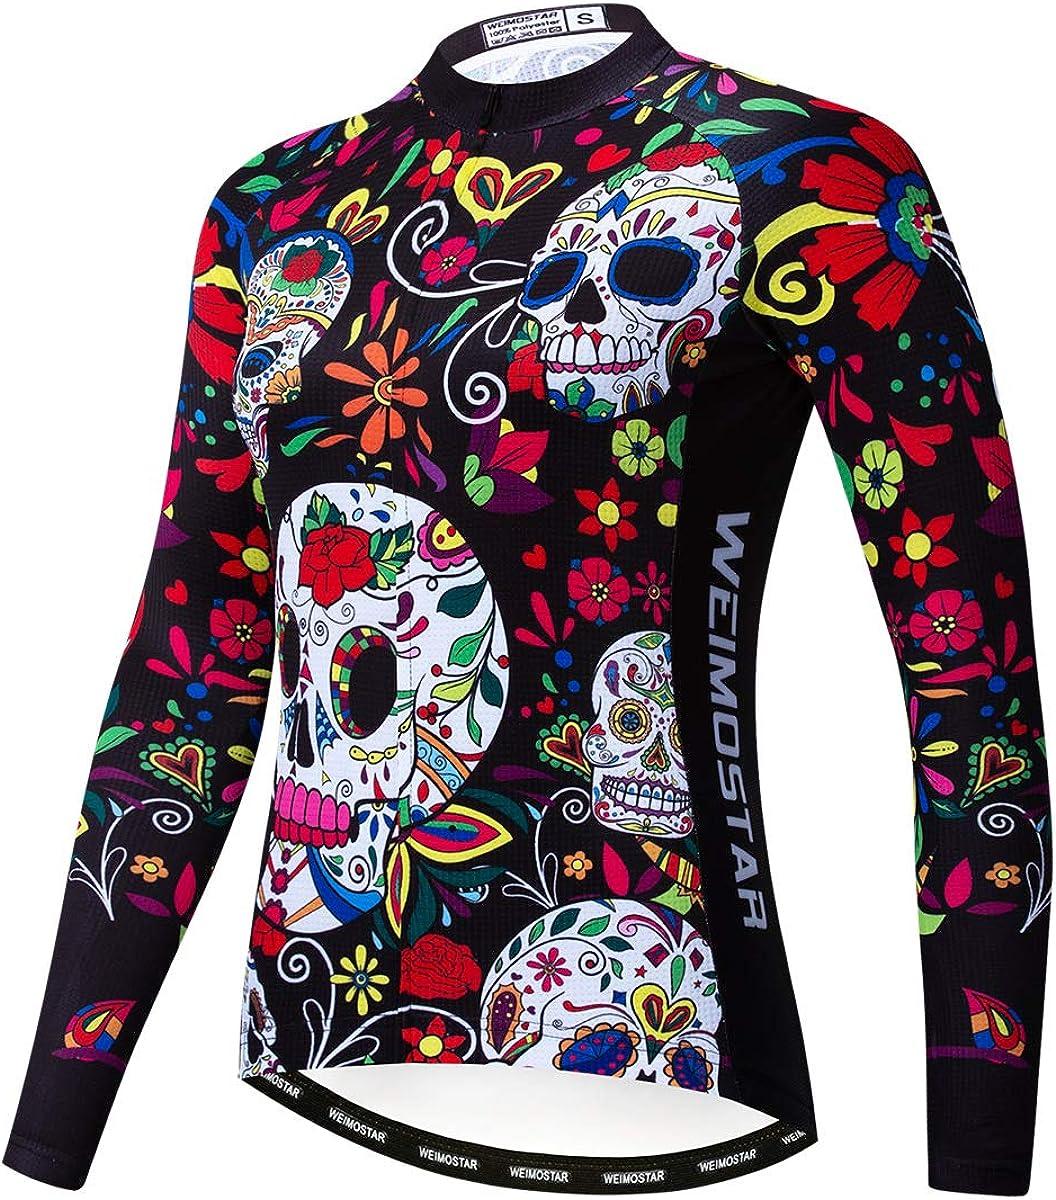 Womens Autumn bike Tops Cycling jersey bicycle long sleeve shirt Sports uniform